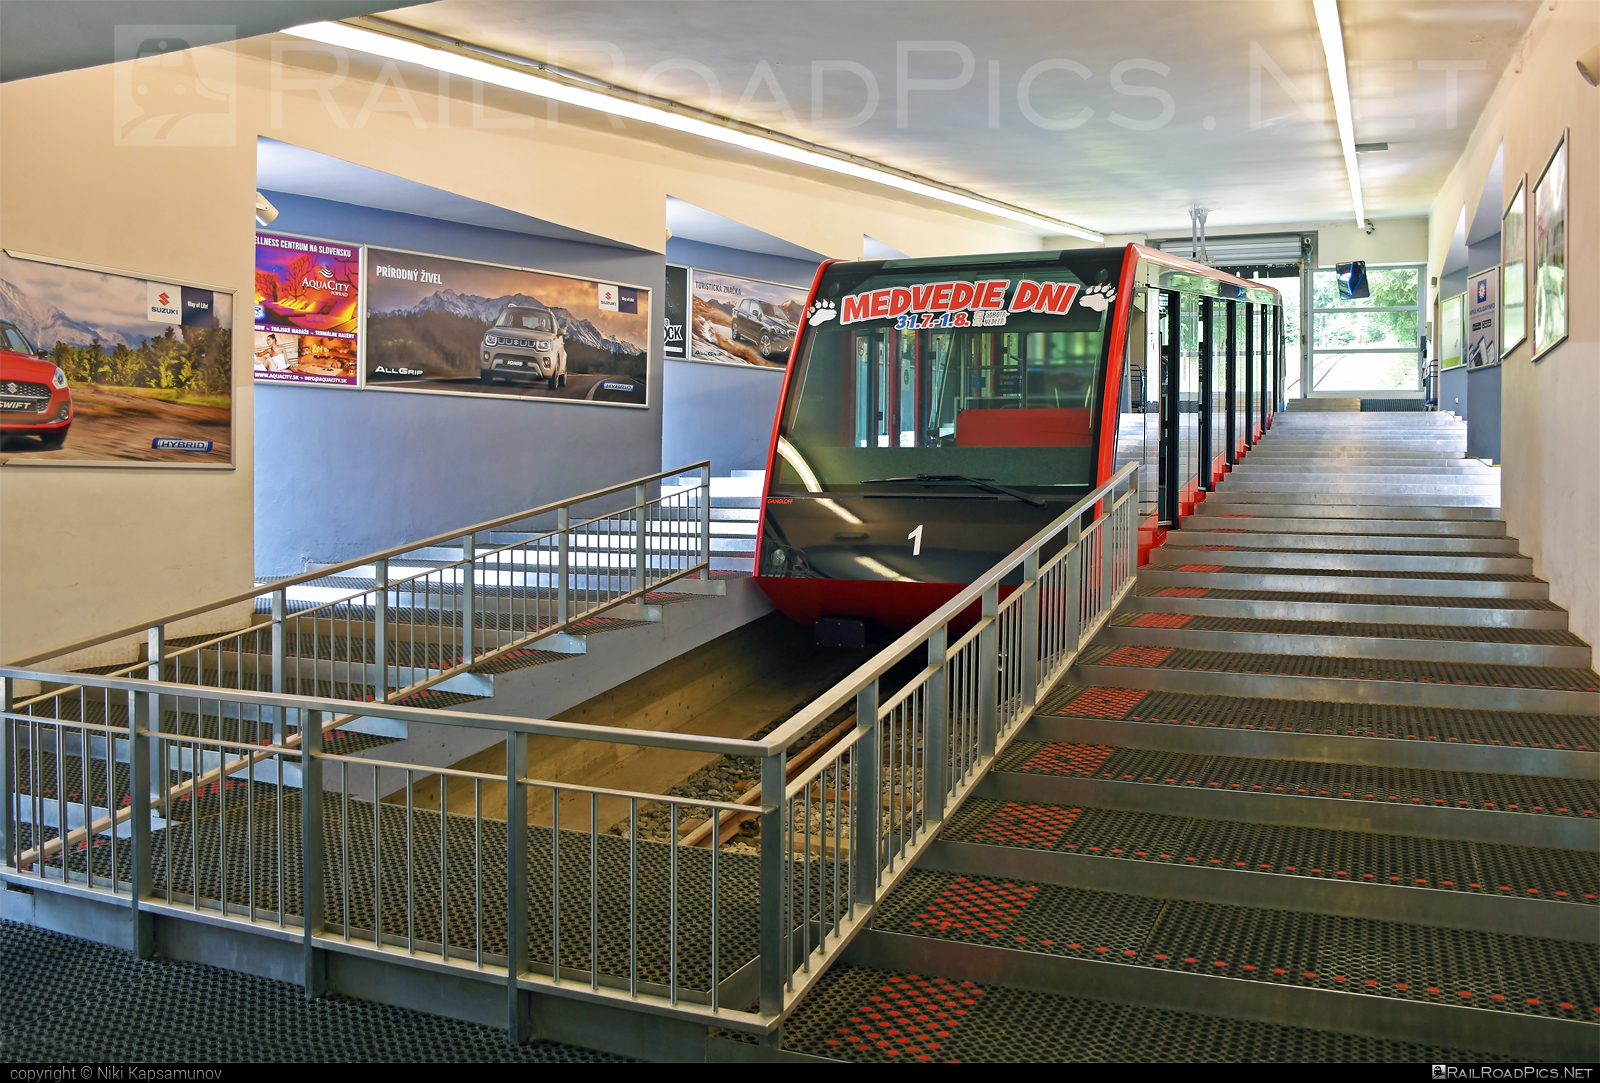 Gangloff TLD funicular car - 1 operated by Tatry mountain resorts, a.s. #TatryMountainResorts #funicular #funicularcablecar #gangloff #ganglofftld #tmr